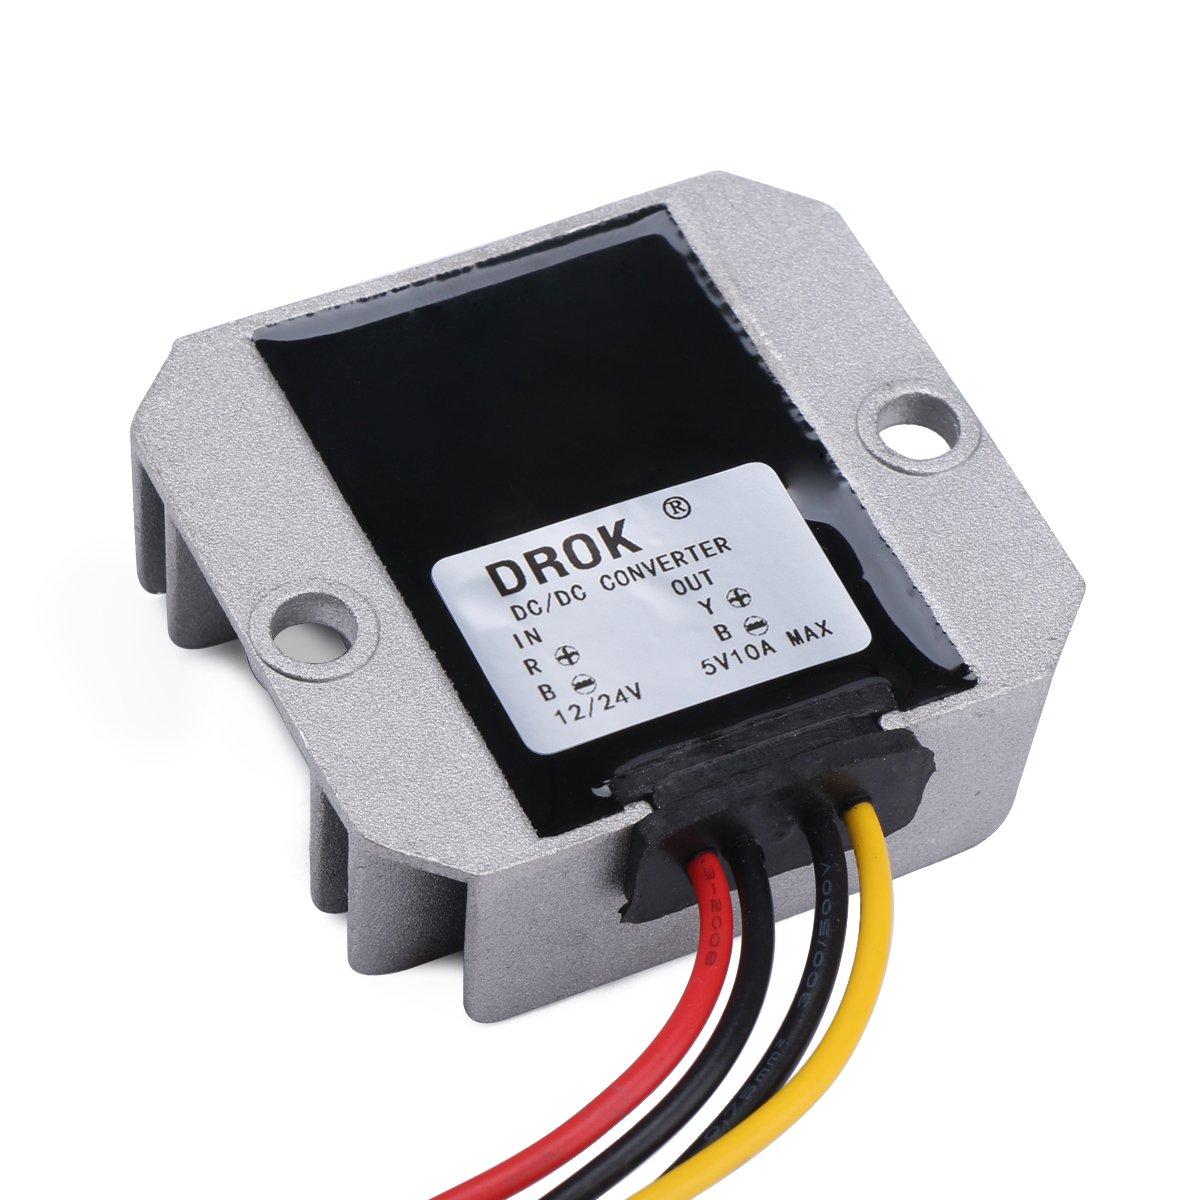 Drok 090586 Dc Waterproof Buck Converter 9 32v Step Circuitthe Circuit To Ac Converterdc Converter12v Down 5v Voltage Regulator 10a 50w Power Supply Industrial Scientific